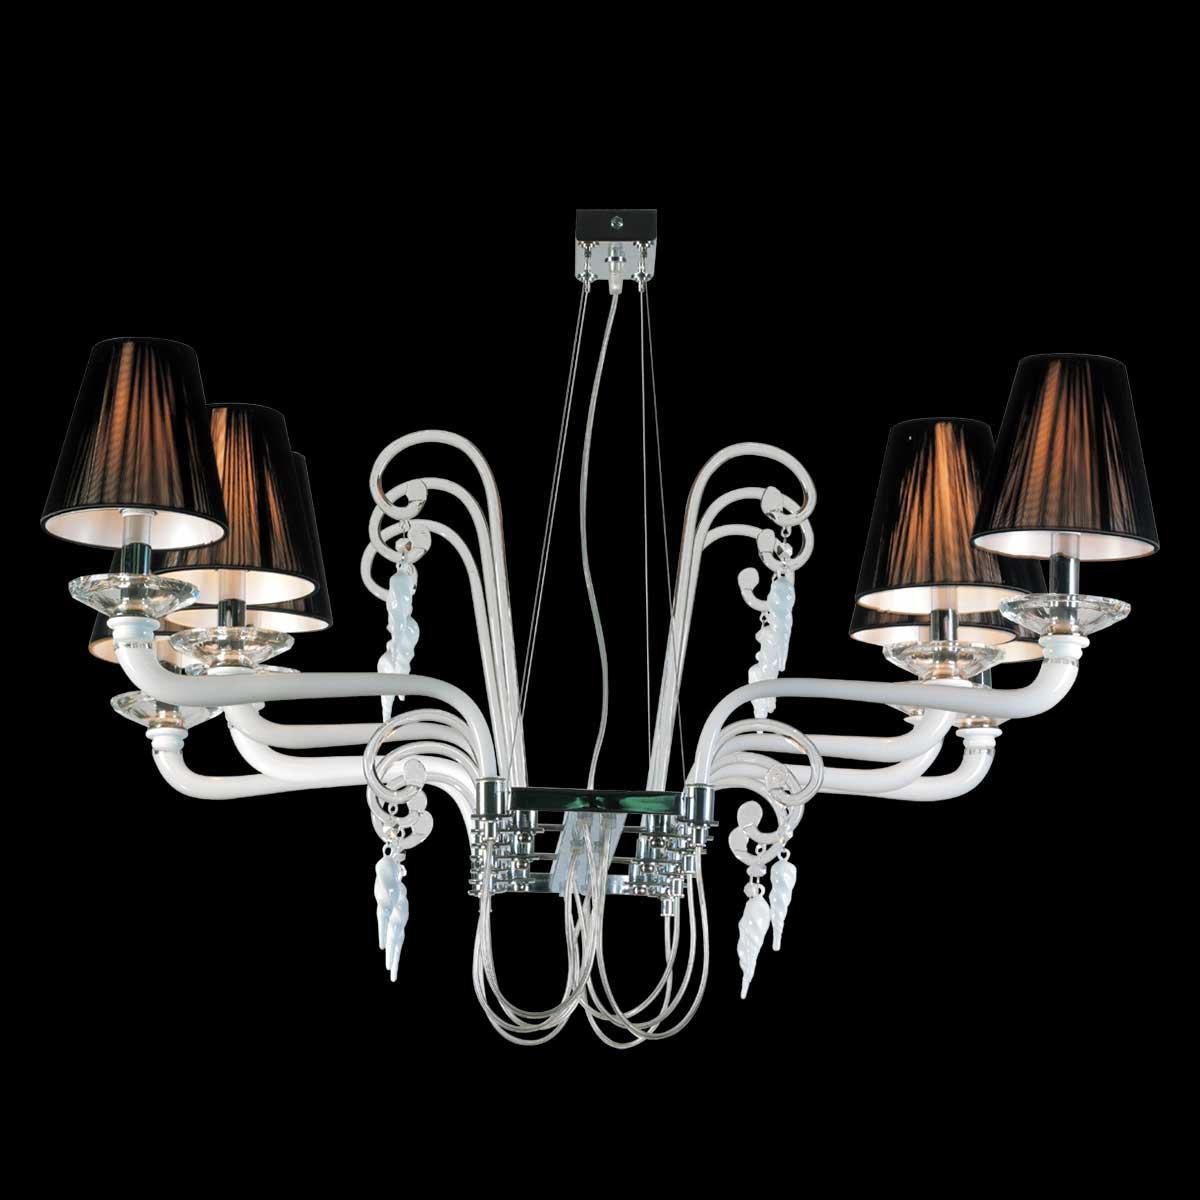 """Giuseppina"" Murano glass chandelier - 8 lights - white"